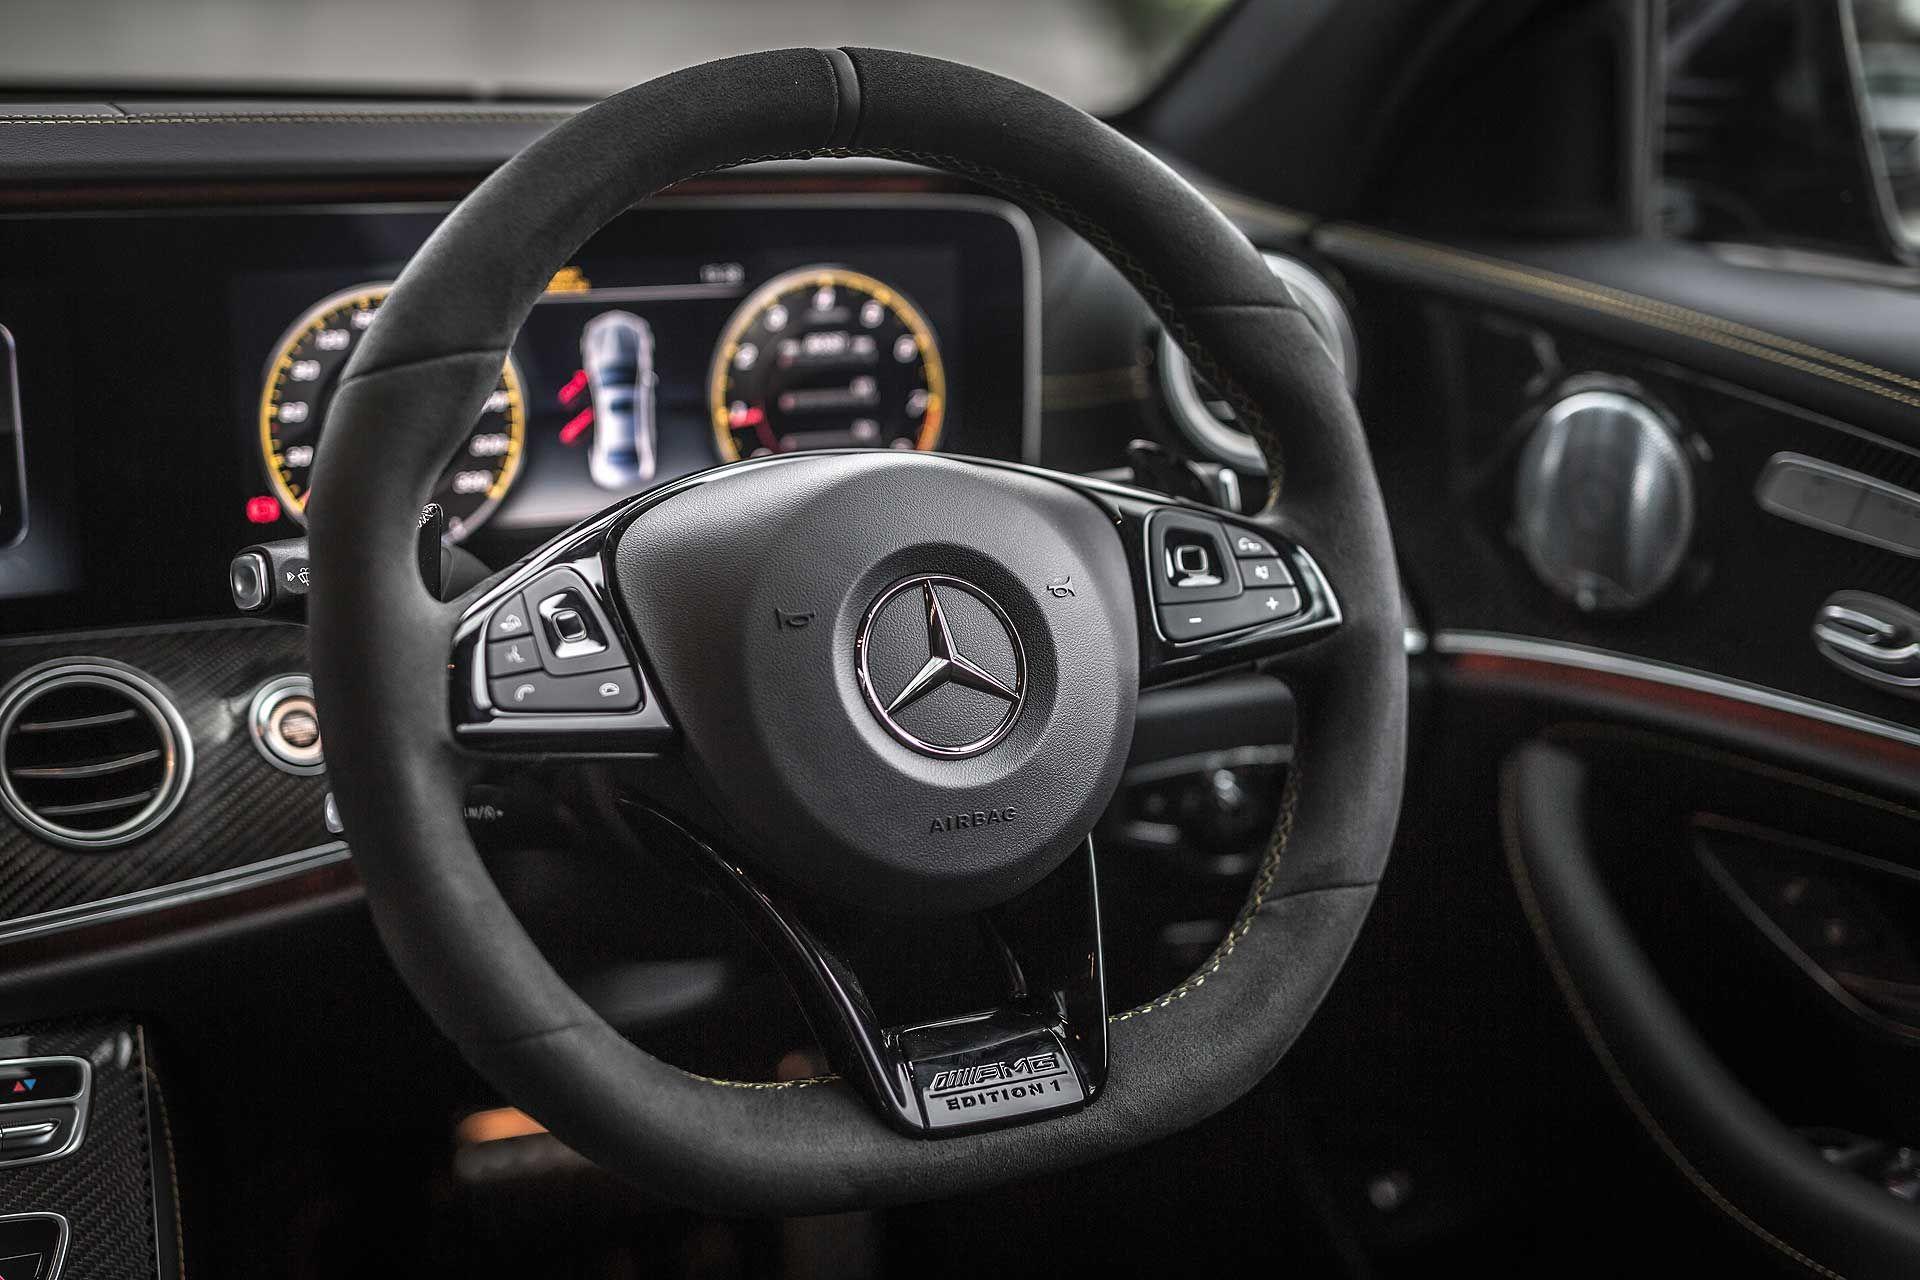 Mercedes-AMG E 63 S 4MATIC+ 2